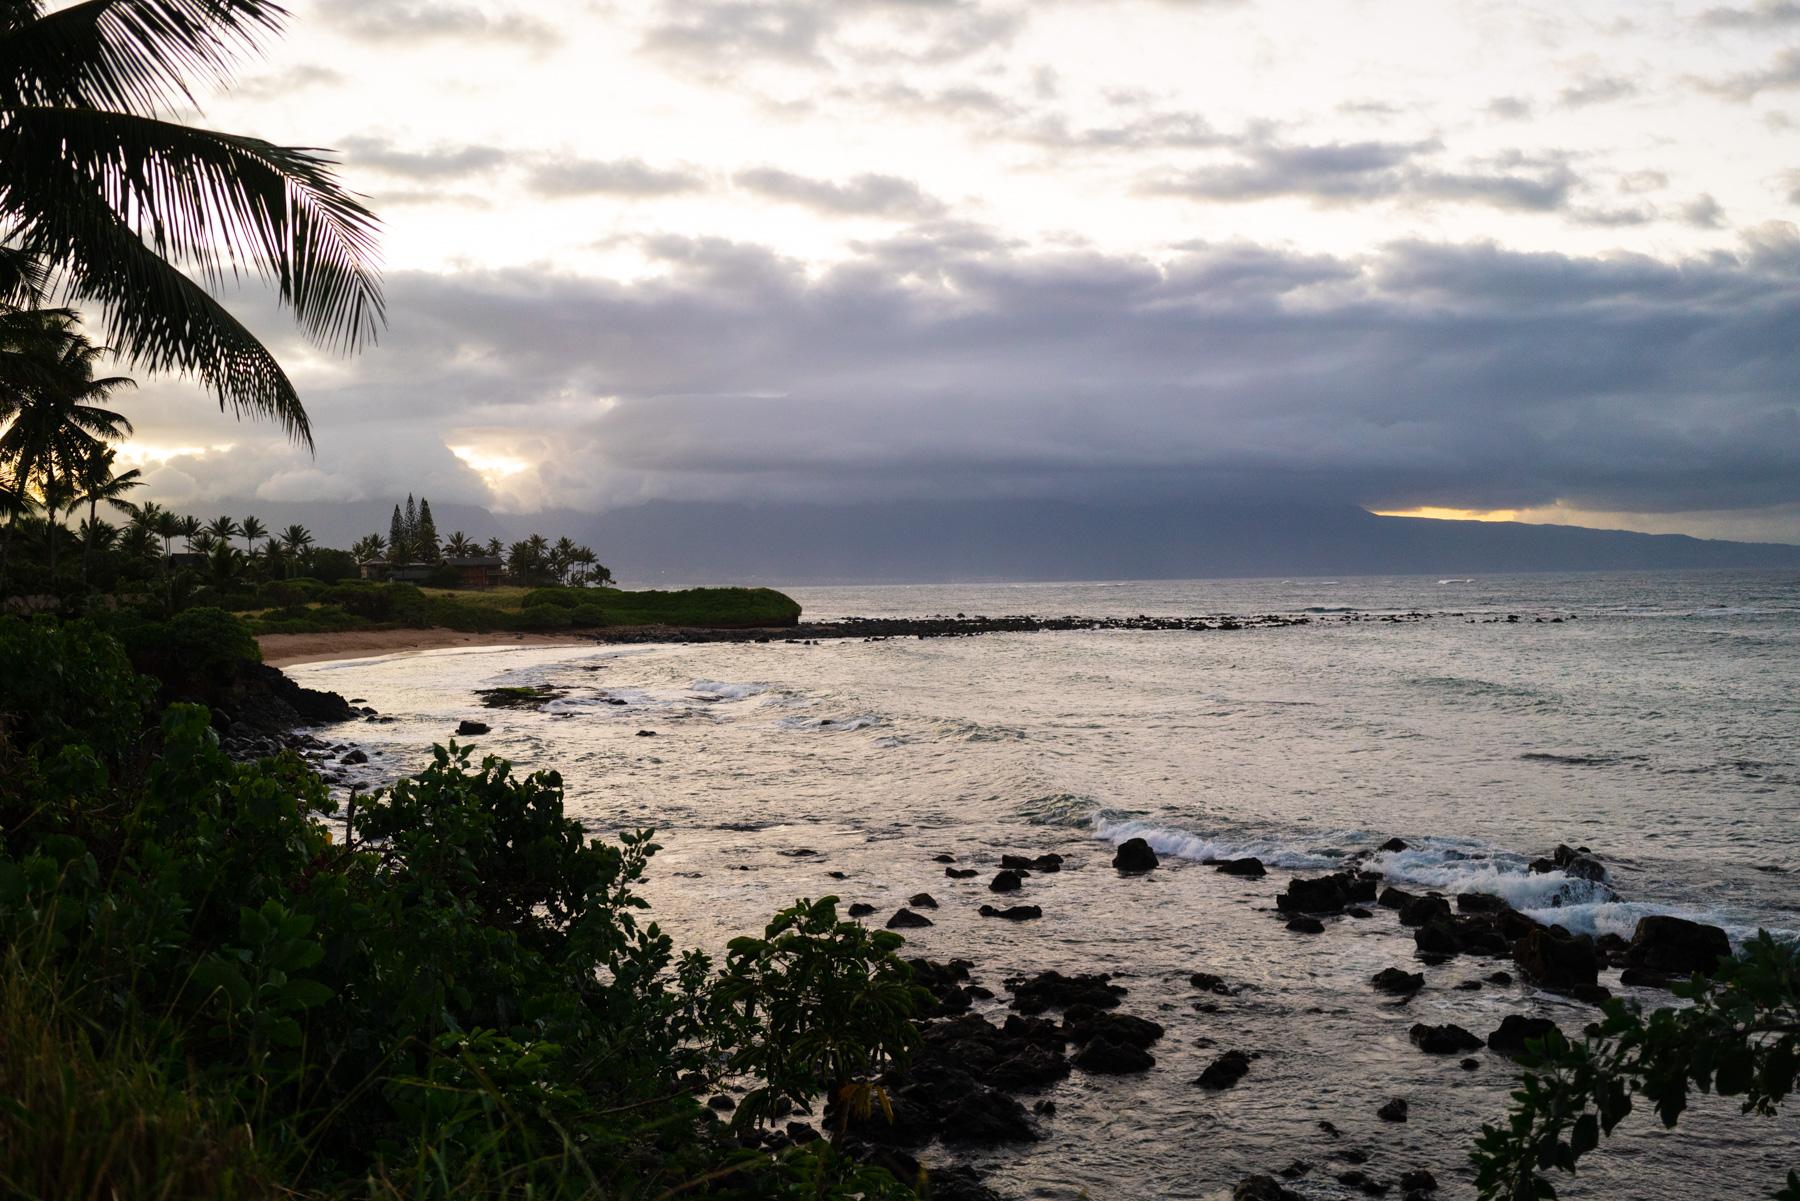 Maui-Trip-Kite-52.jpg